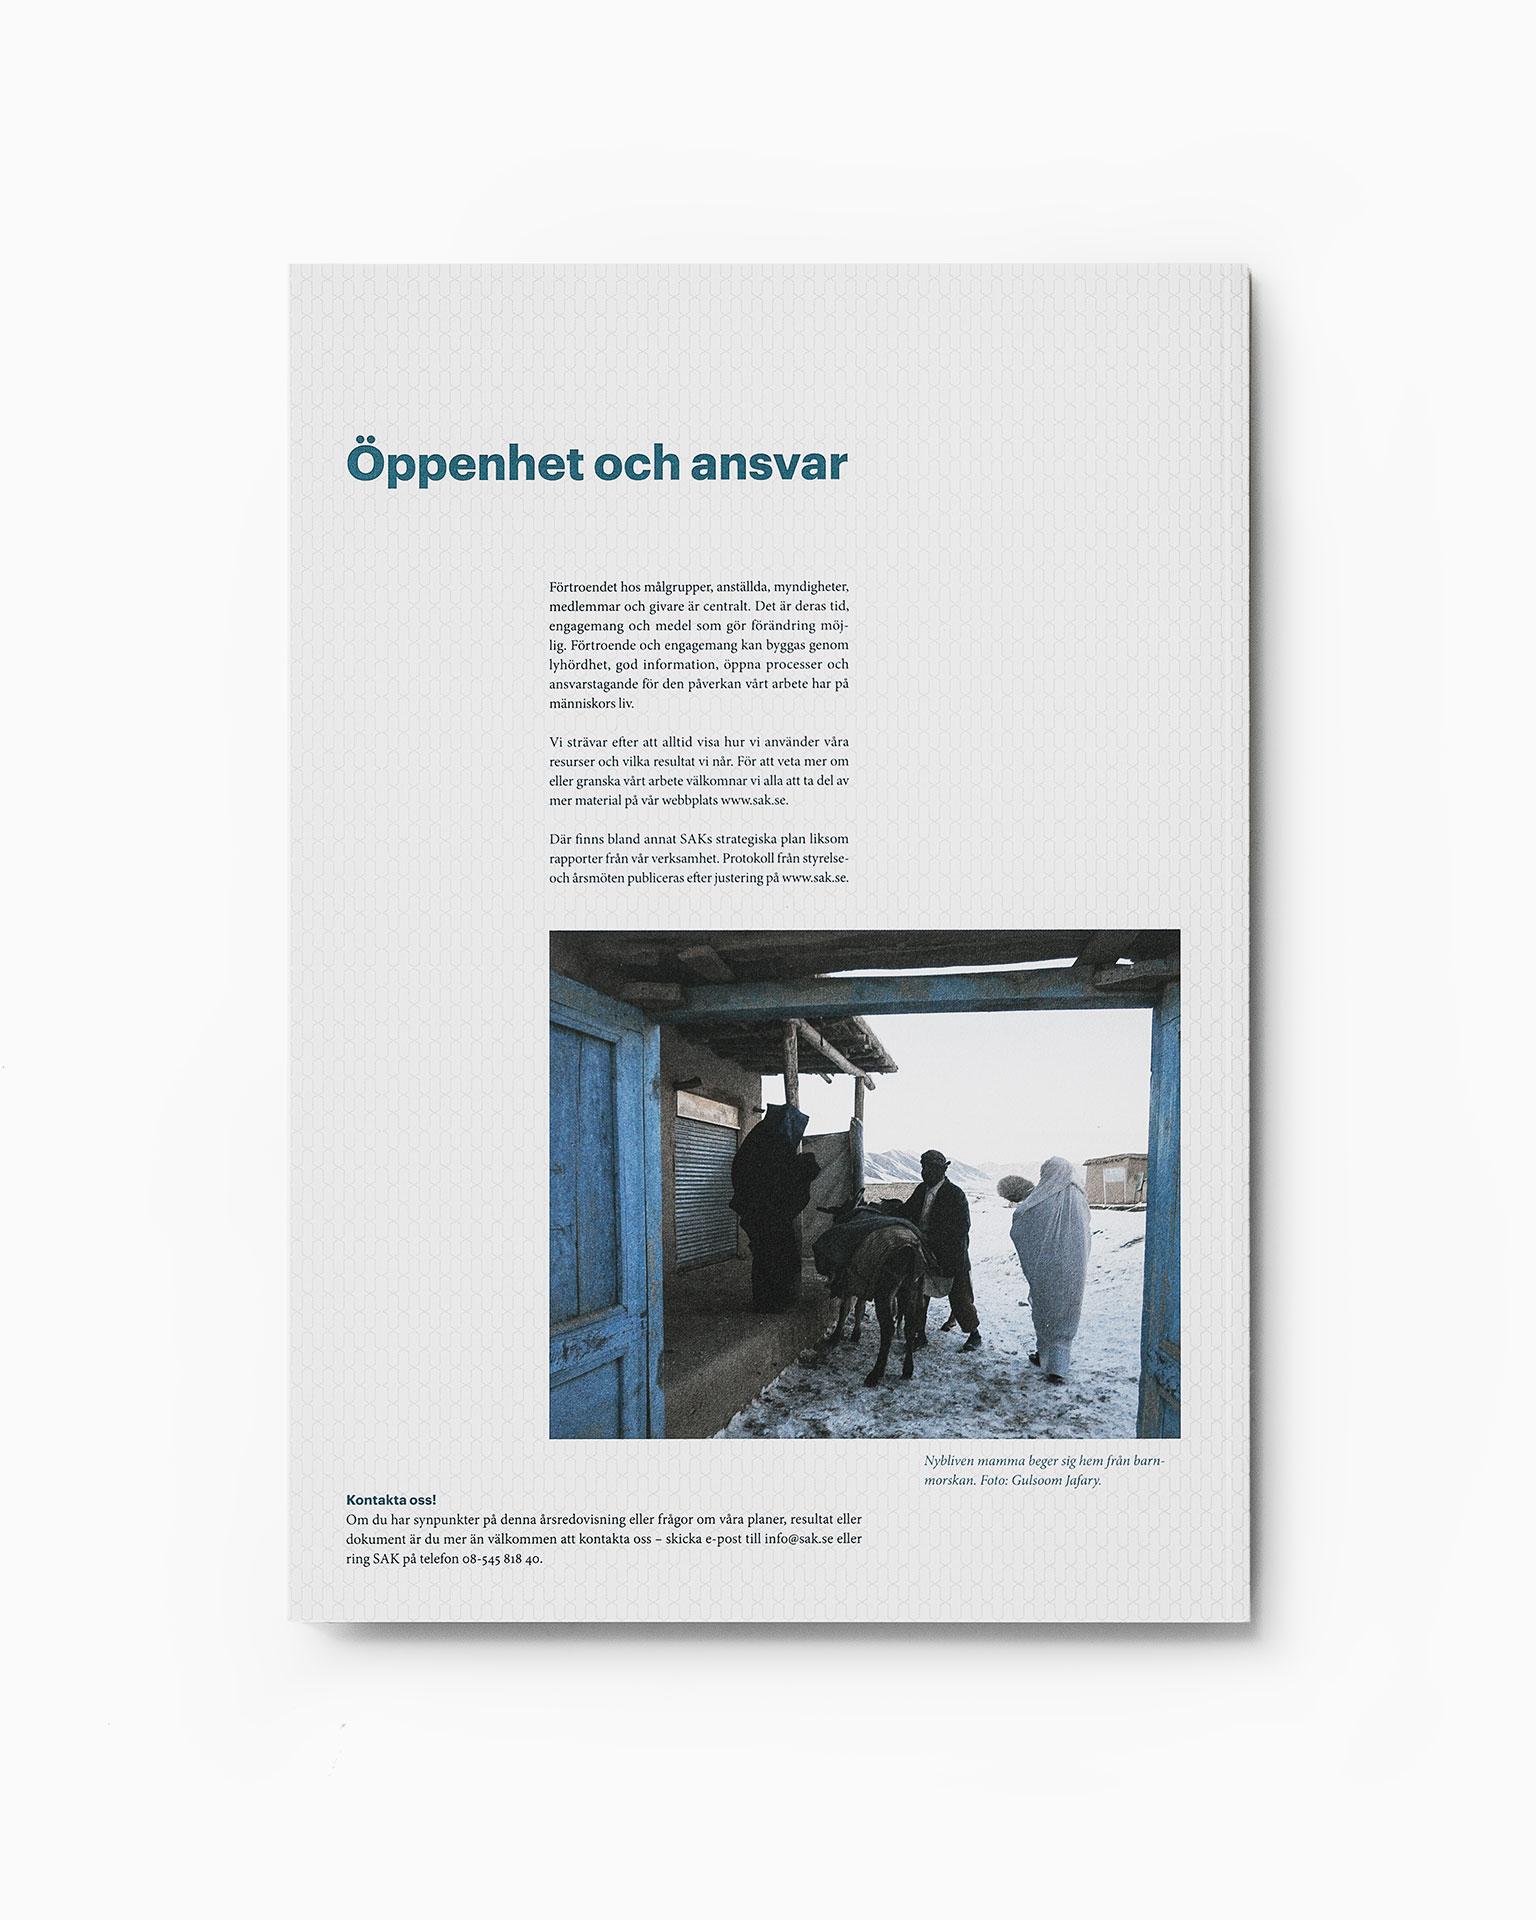 Mattias_Amnas_SAK_publication_02.jpg